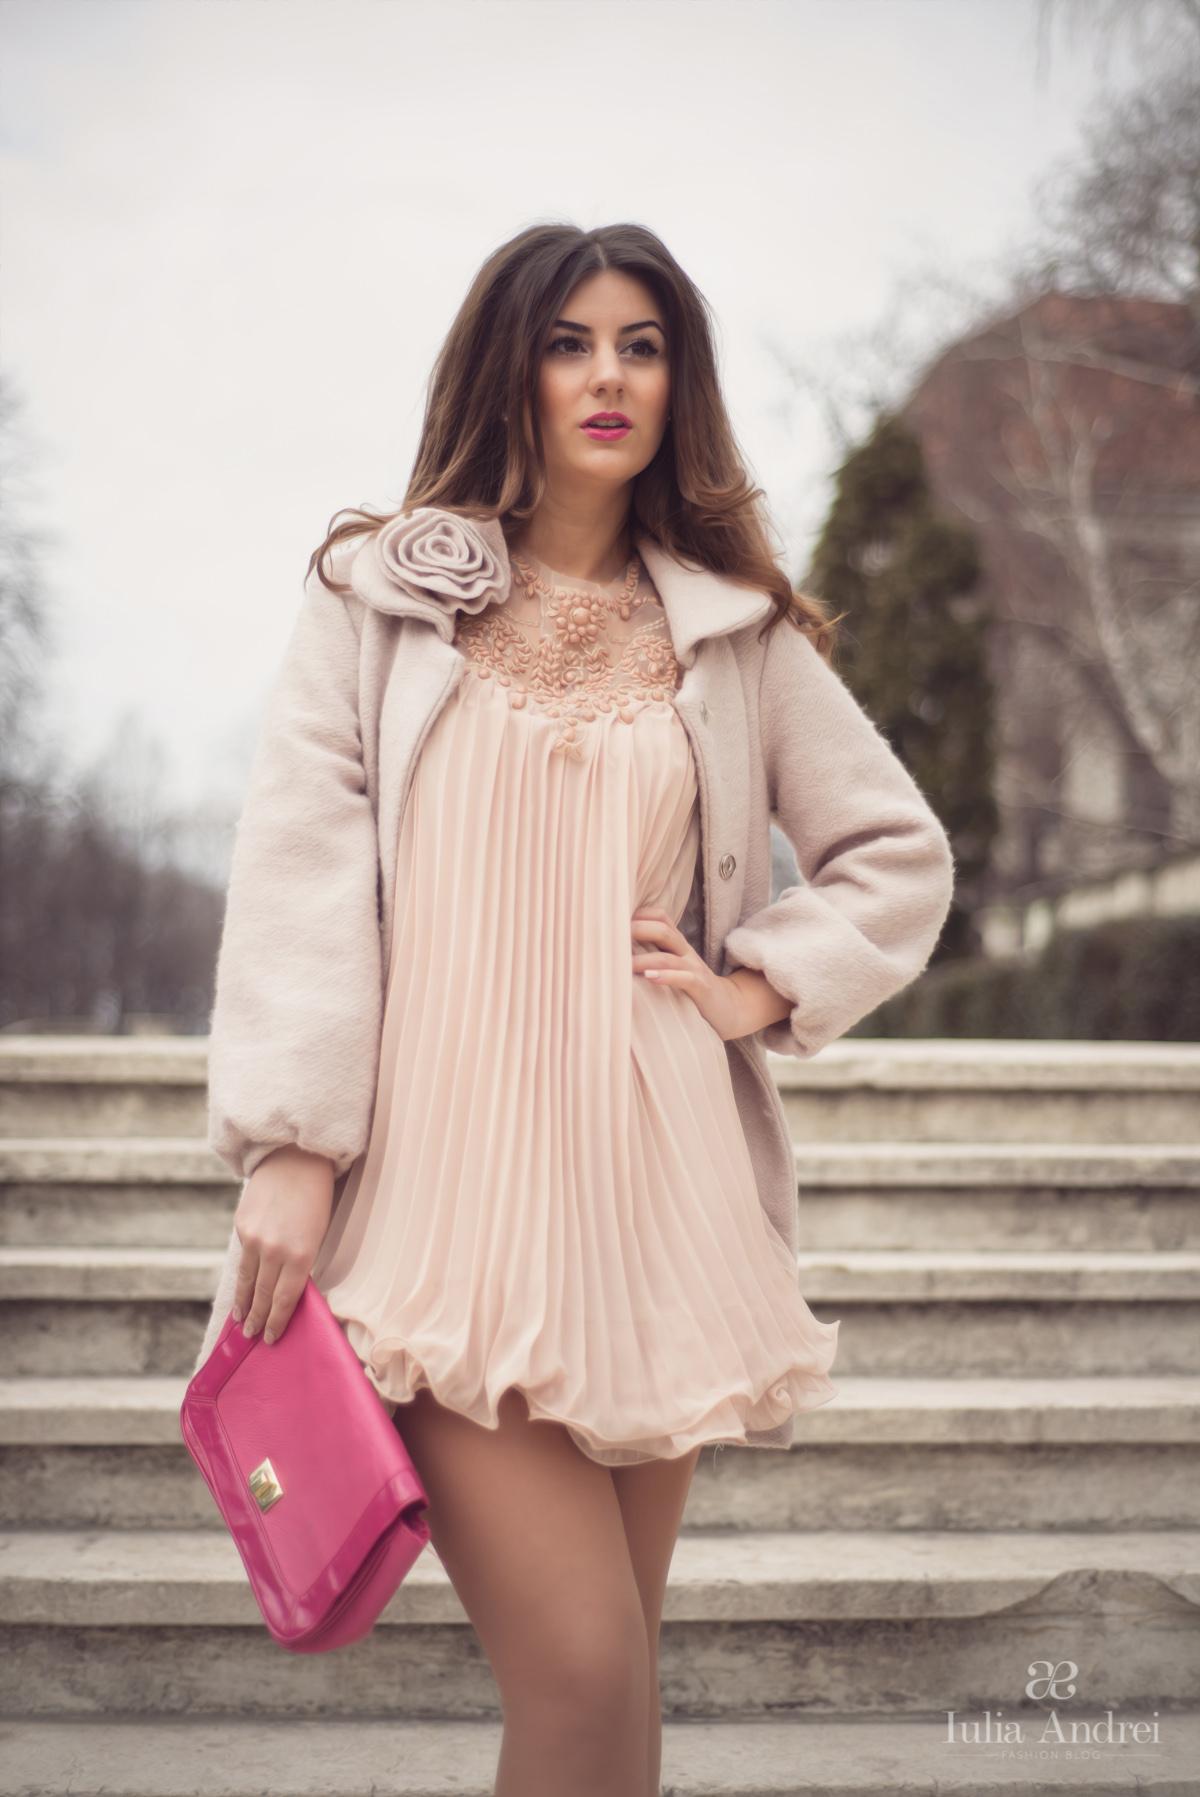 tinuta rochia nude pentru ziua indragostitilor valentine's day 14 februarie dragobete iulia andrei fashion blog